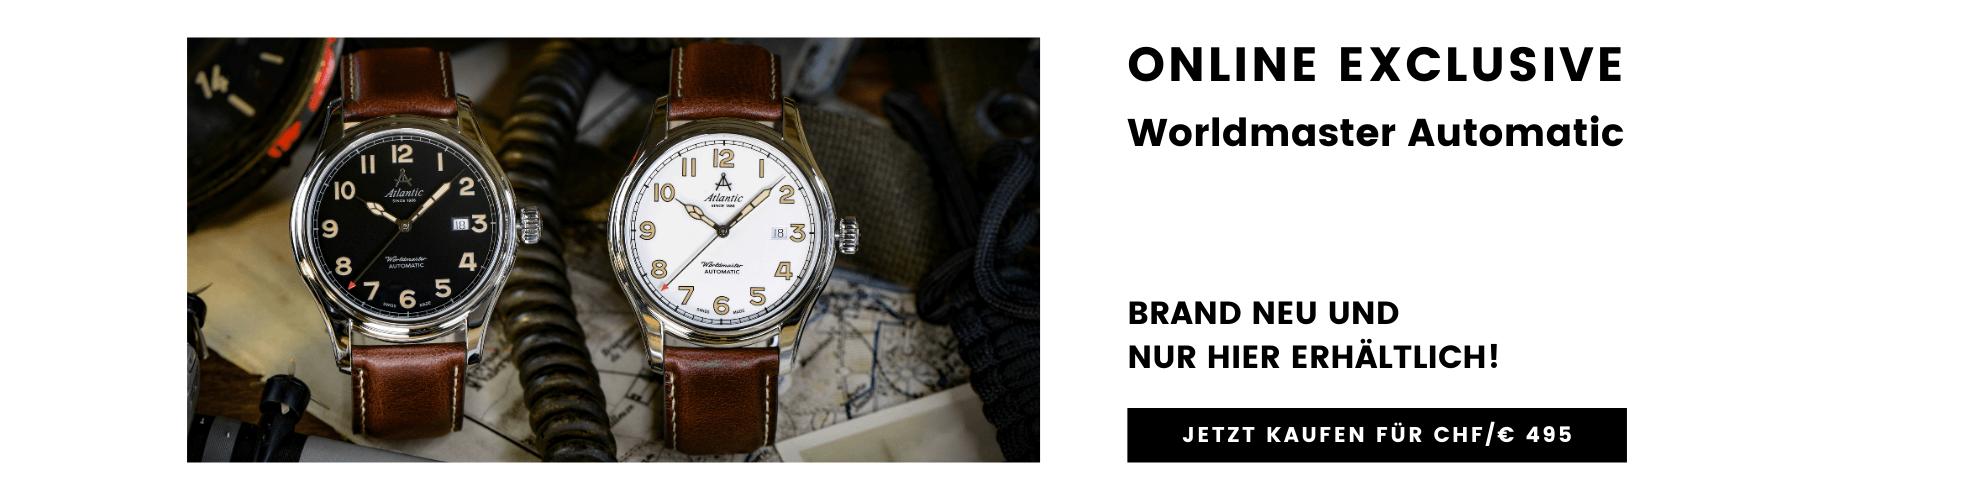 Atlantic Worldmaster Automatic Online Exclusive - Jetzt Kaufen